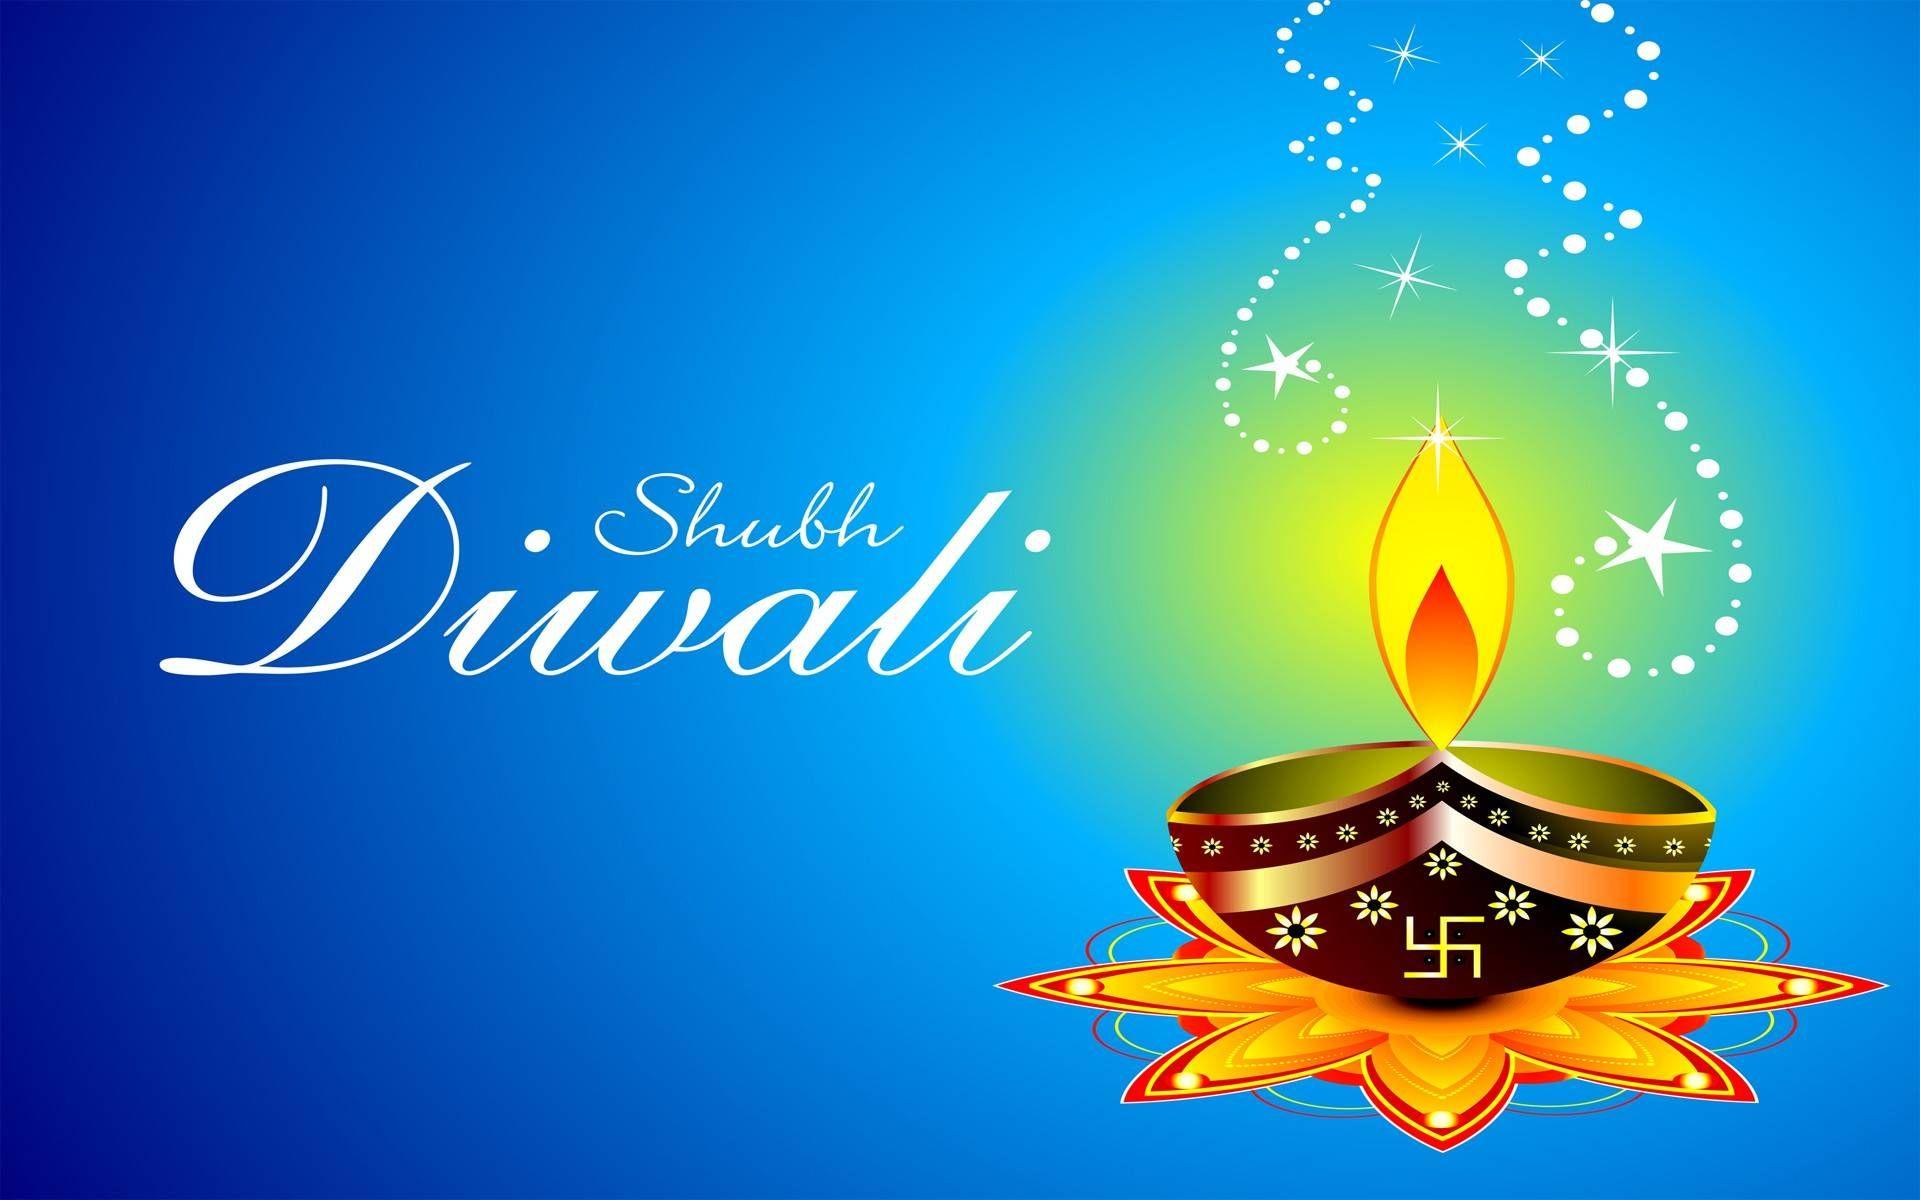 Happy Diwali 2015 Wallpapers With SMS tivalworldz